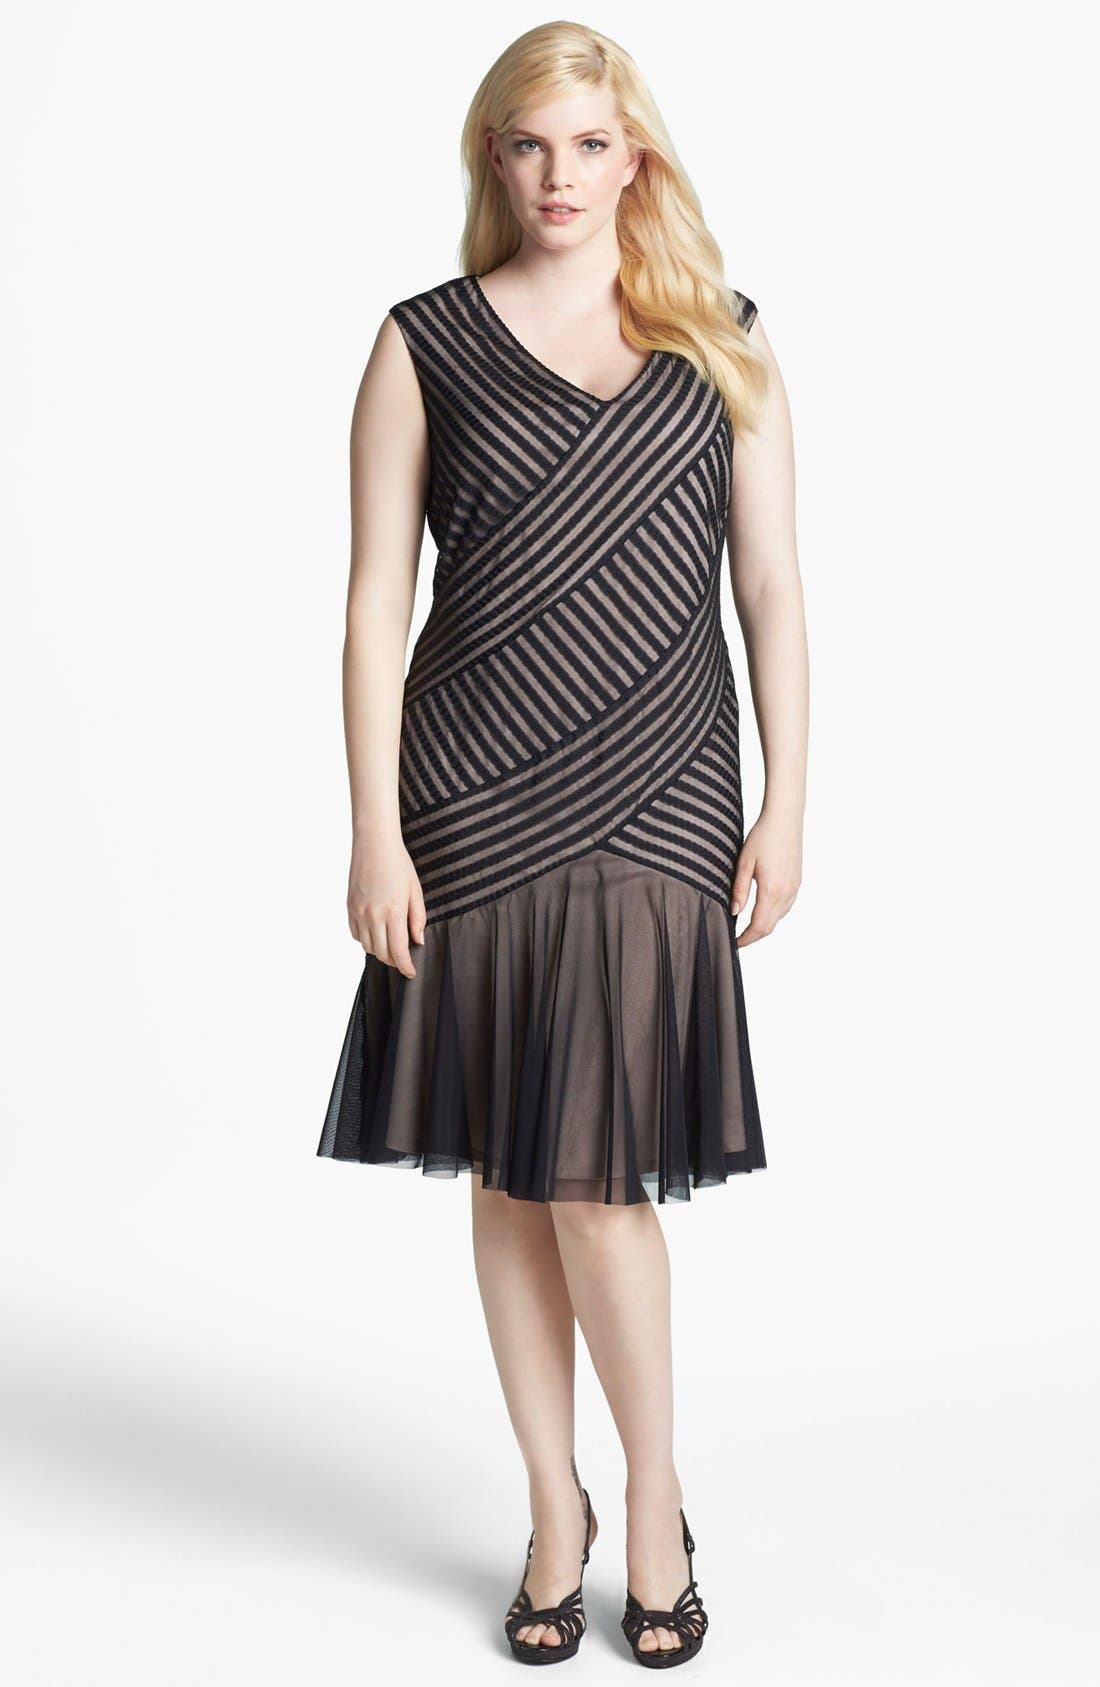 Alternate Image 1 Selected - London Times Cable & Mesh Drop Waist Dress (Plus Size)